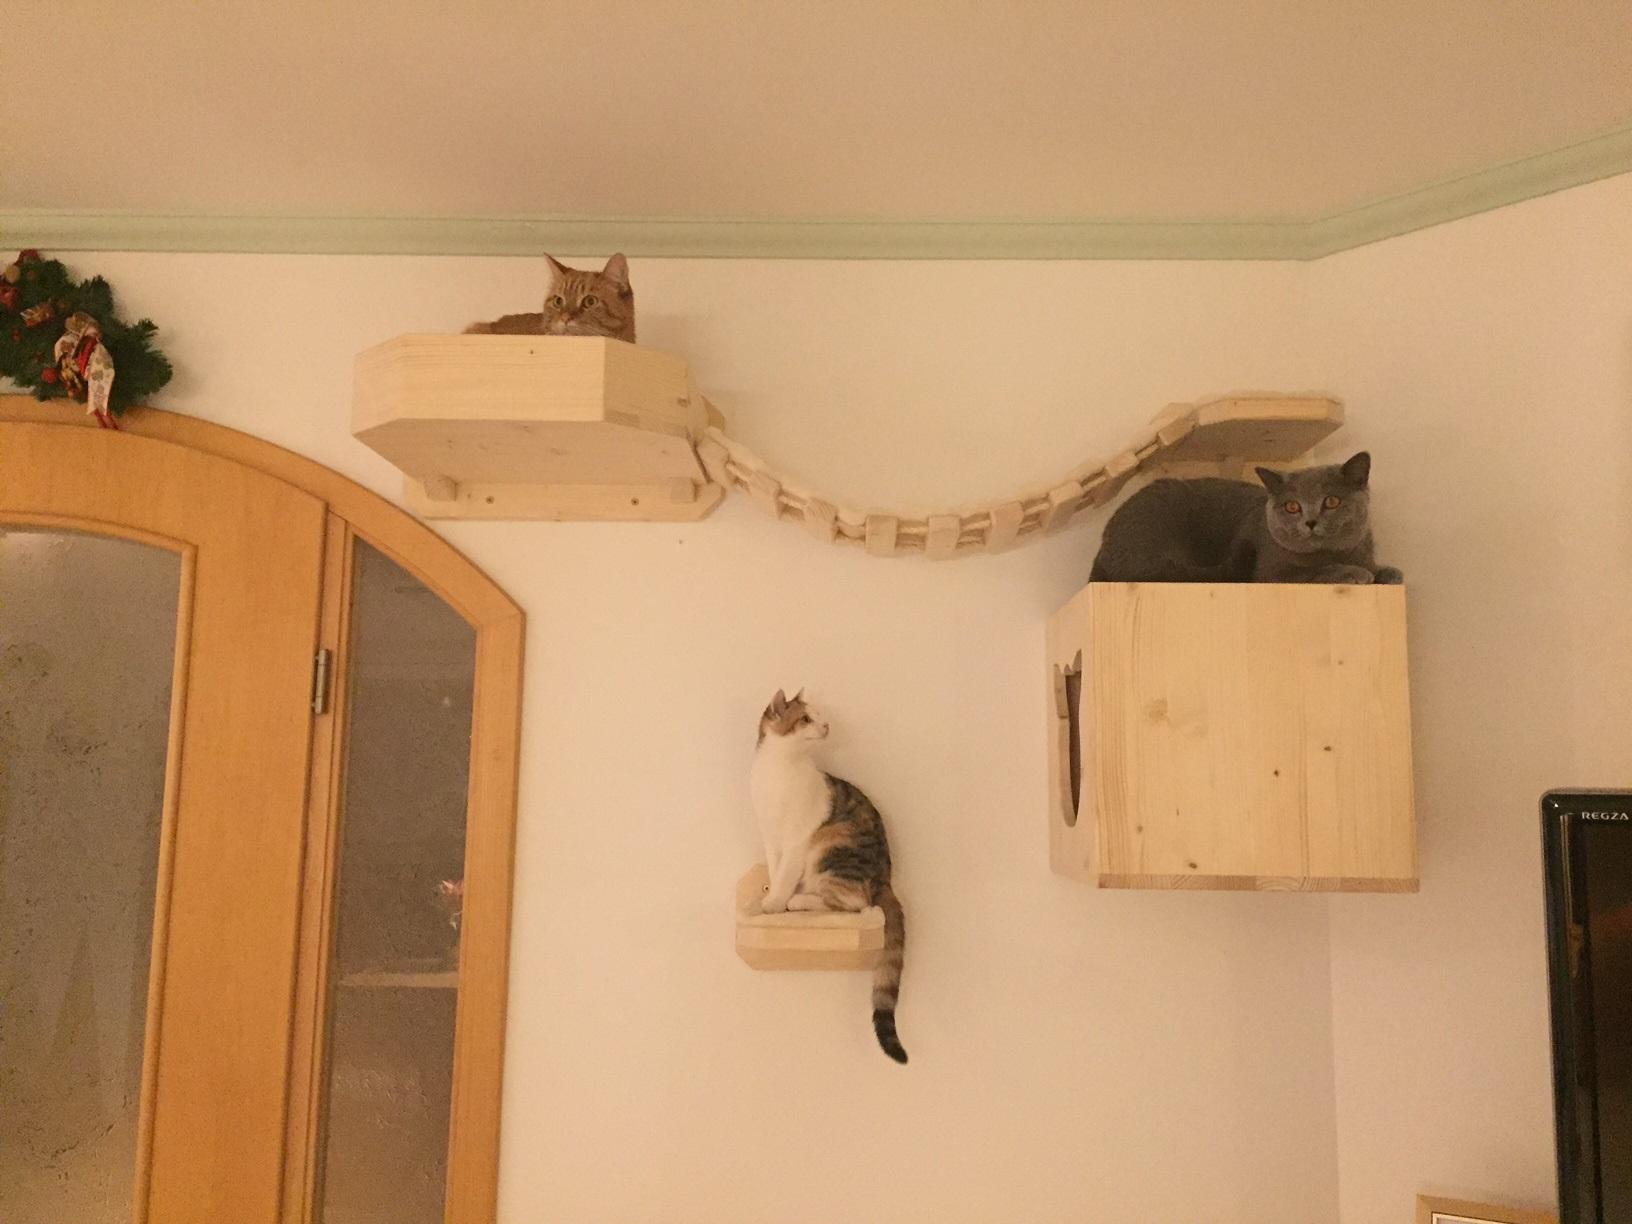 kratzbaum f r die wand f r katzen holzh hle h hle f r. Black Bedroom Furniture Sets. Home Design Ideas